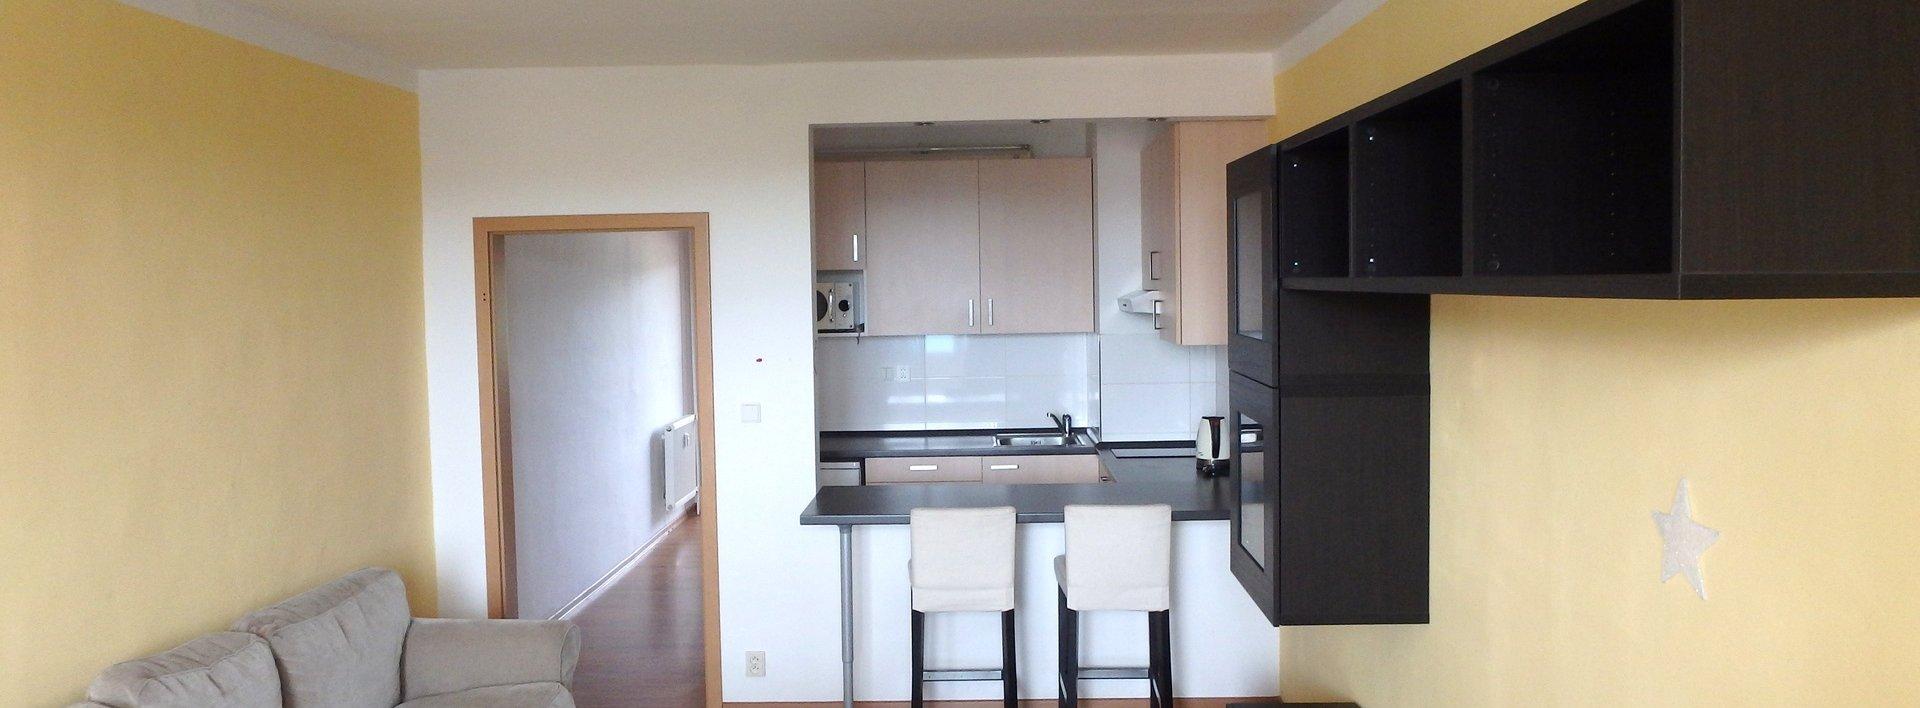 Prodej bytu 1+1, 34 m² s lodžií - Liberec, Vratislavice n/N, ul. Nad Školou, Ev.č.: N48533